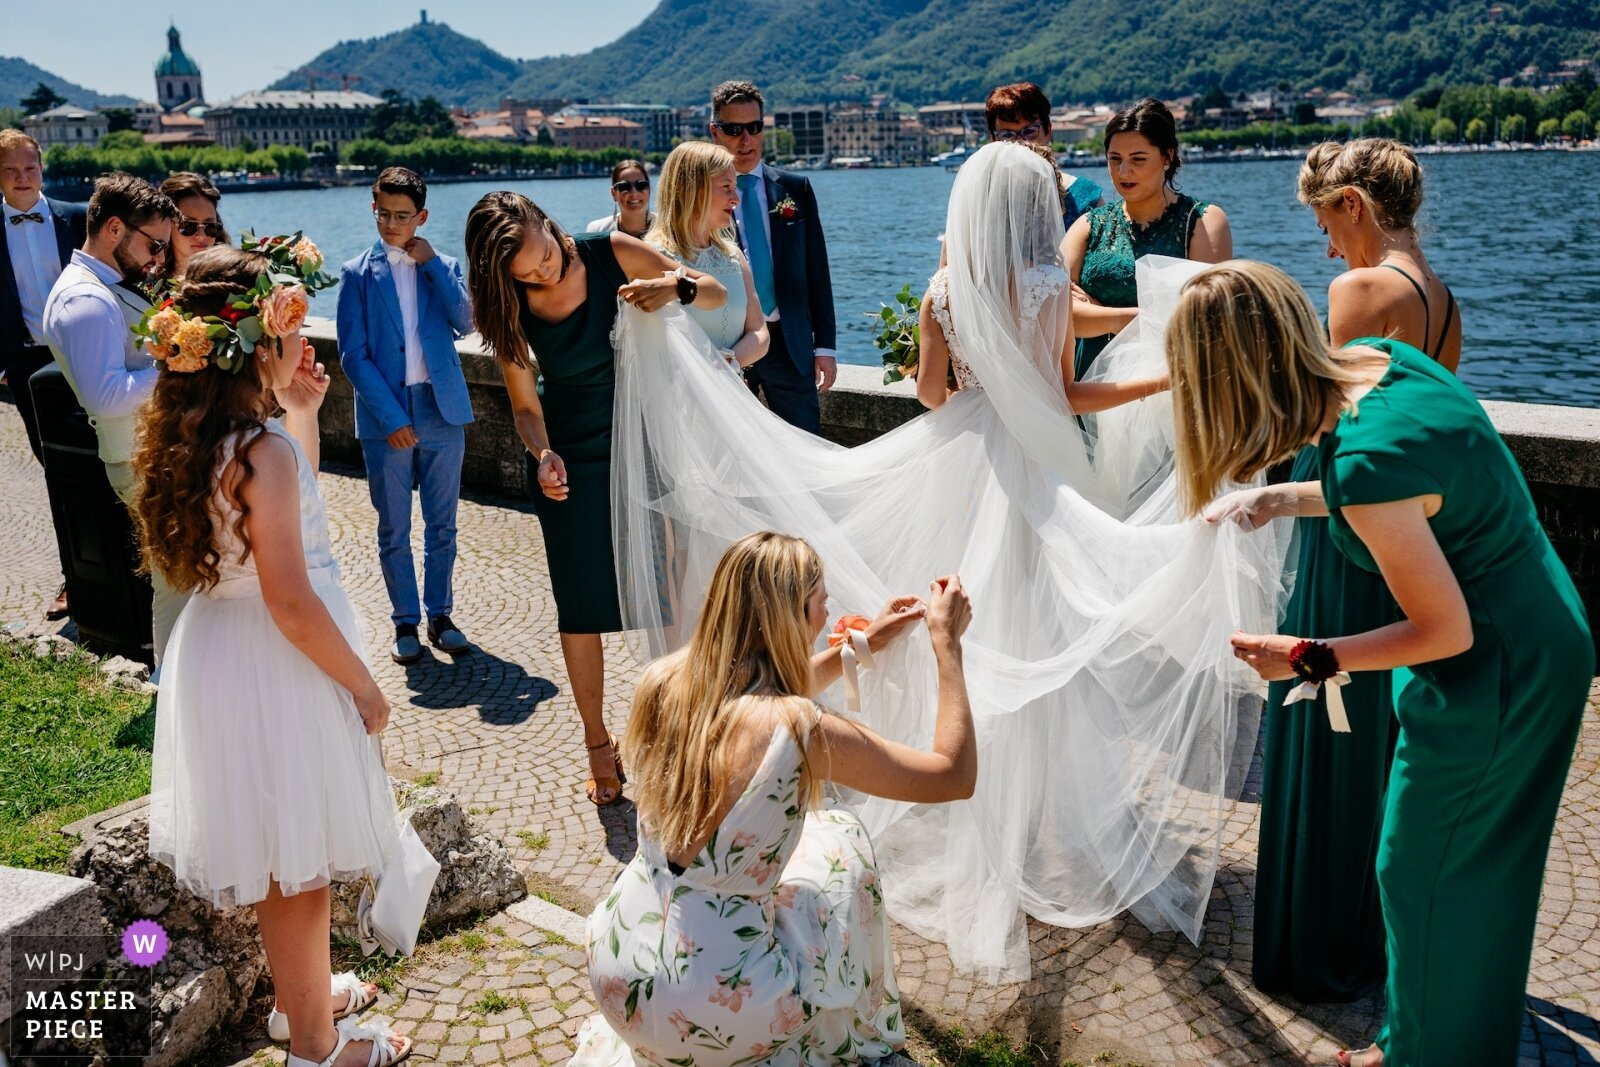 Wedding photo journalists association v12 2019